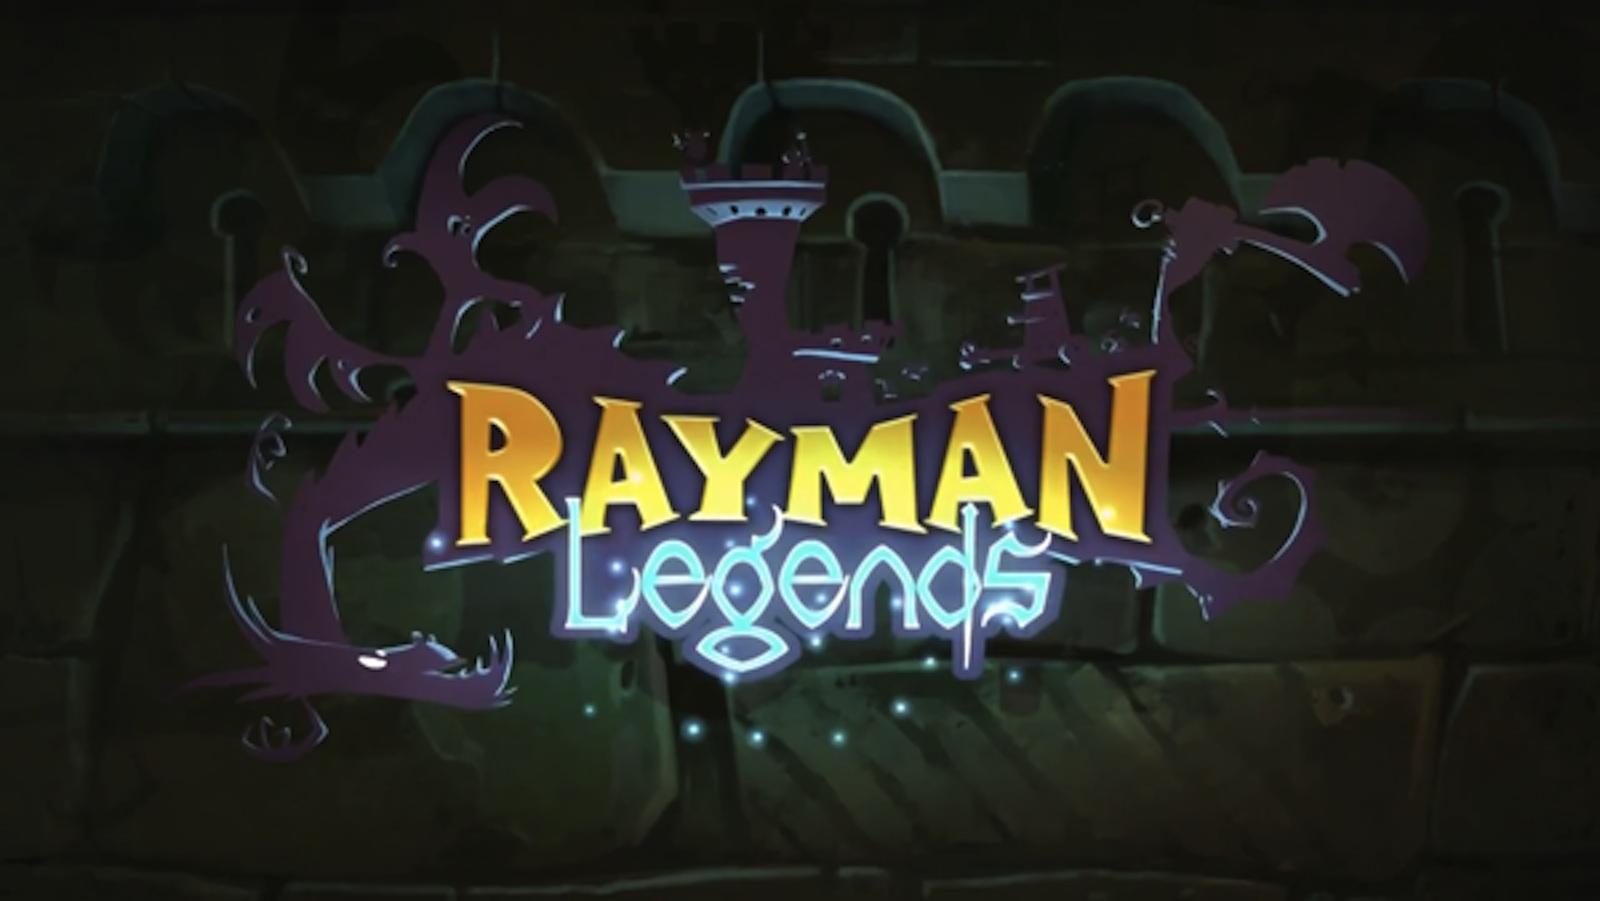 Rayman Legends wallpaper 1